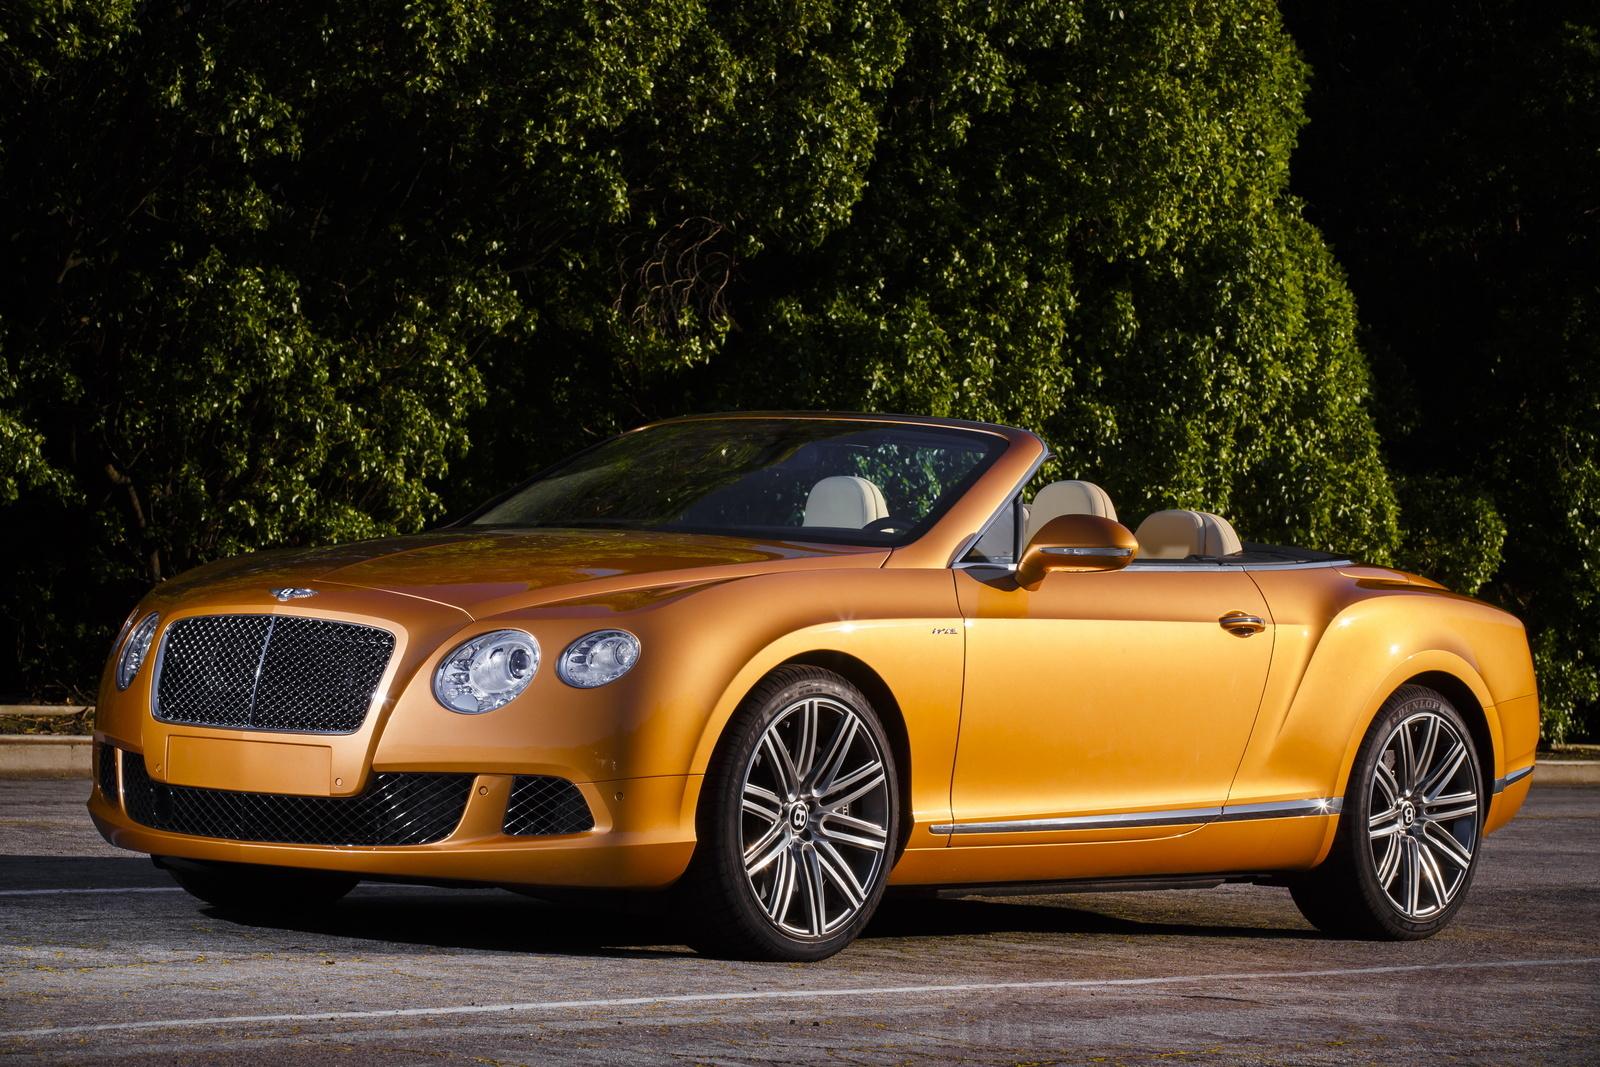 2014 Bentley Continental GTC - Overview - CarGurus